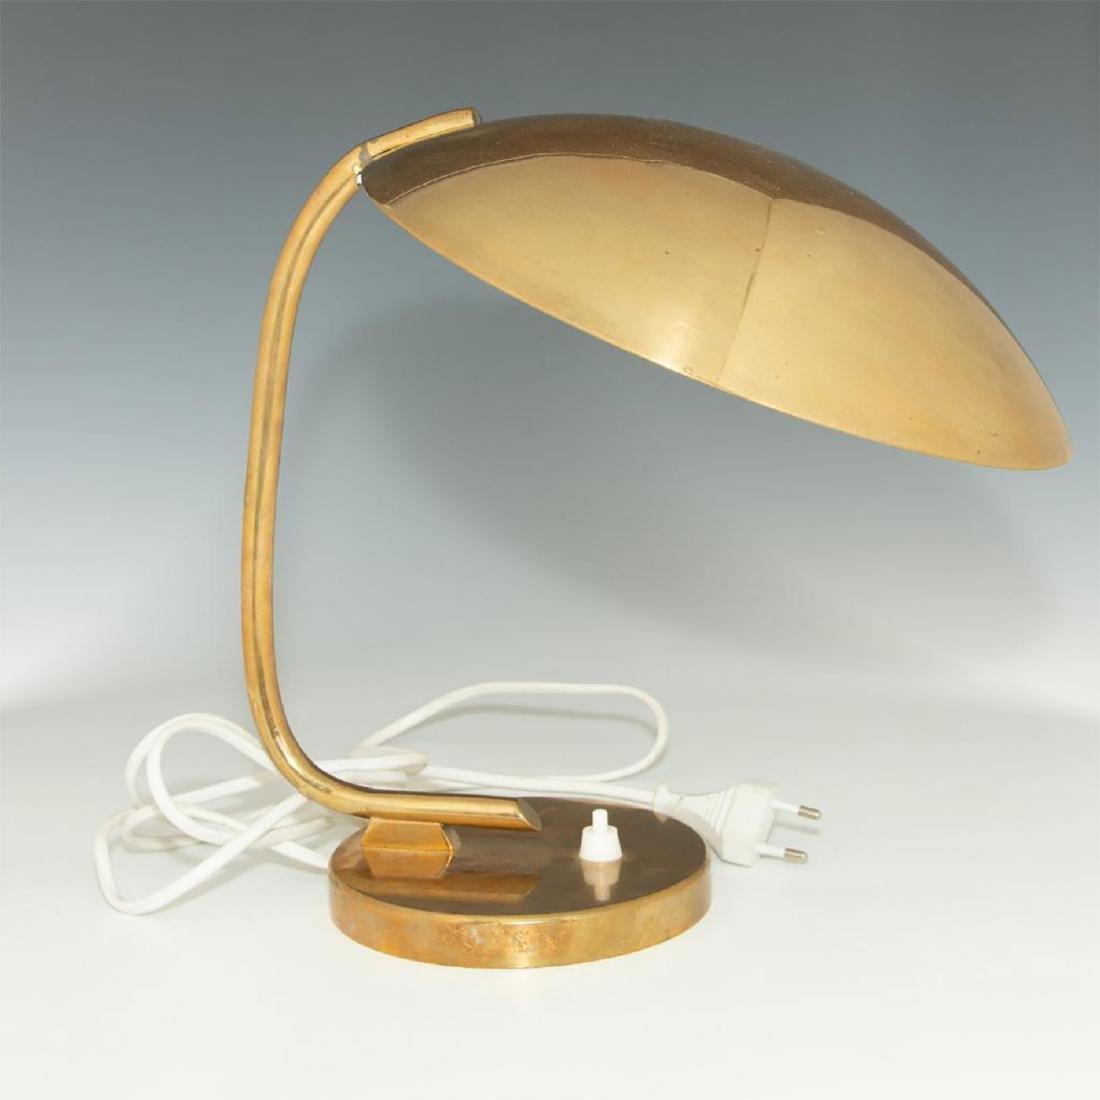 ITSU MADE FINNISH MID-CENTURY MODERN DESK LAMP - 2